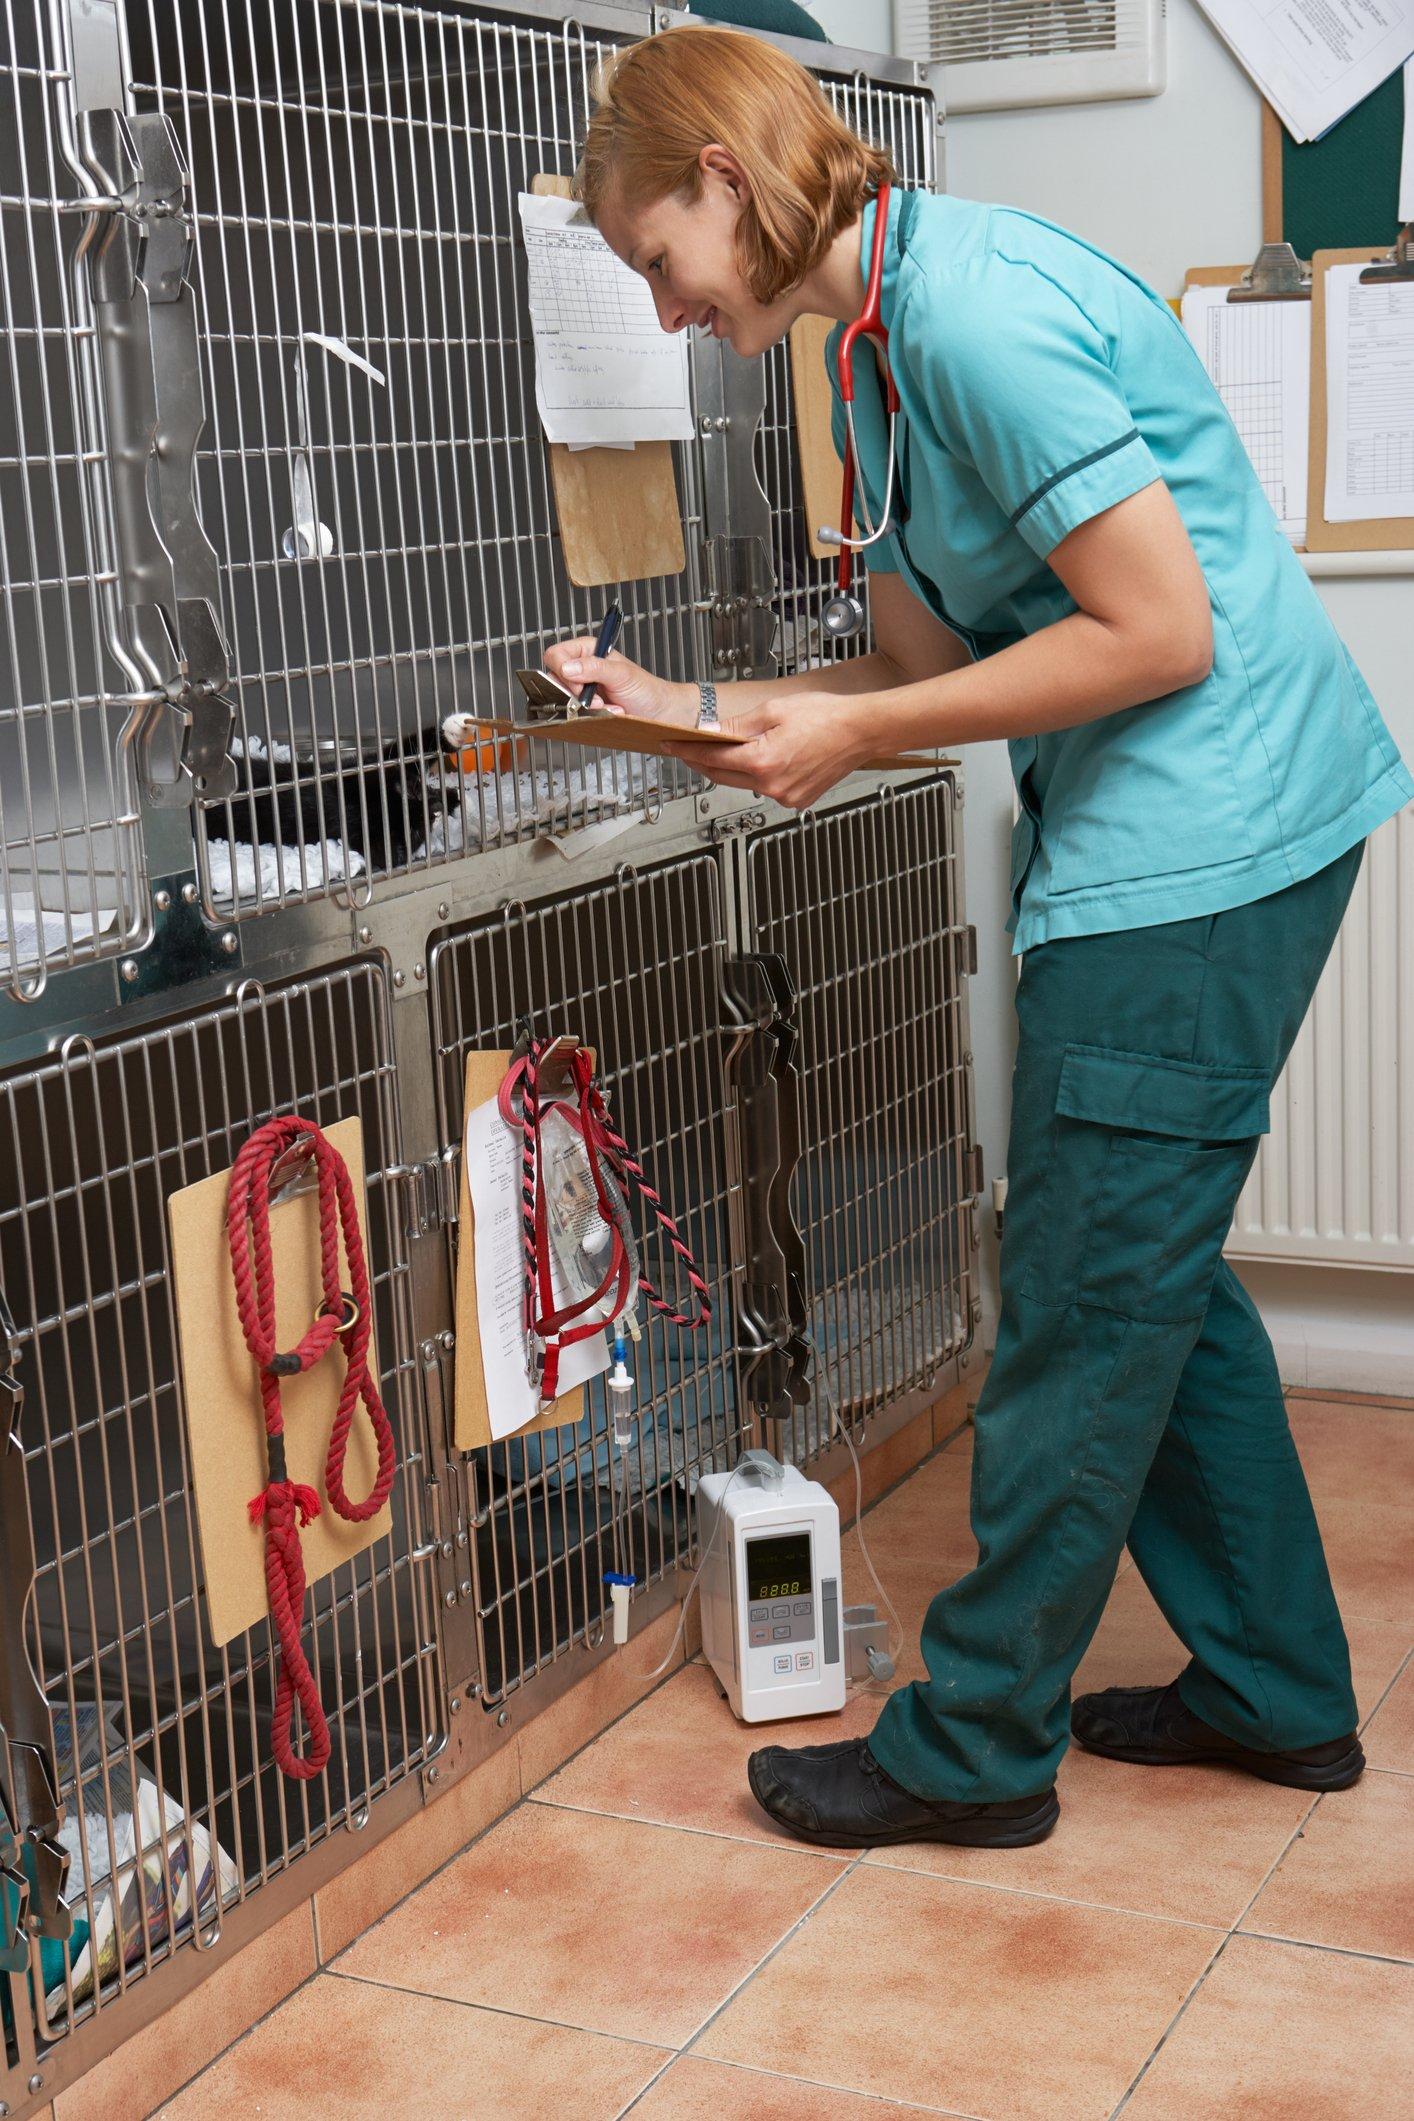 anesthesia veterinary clinic